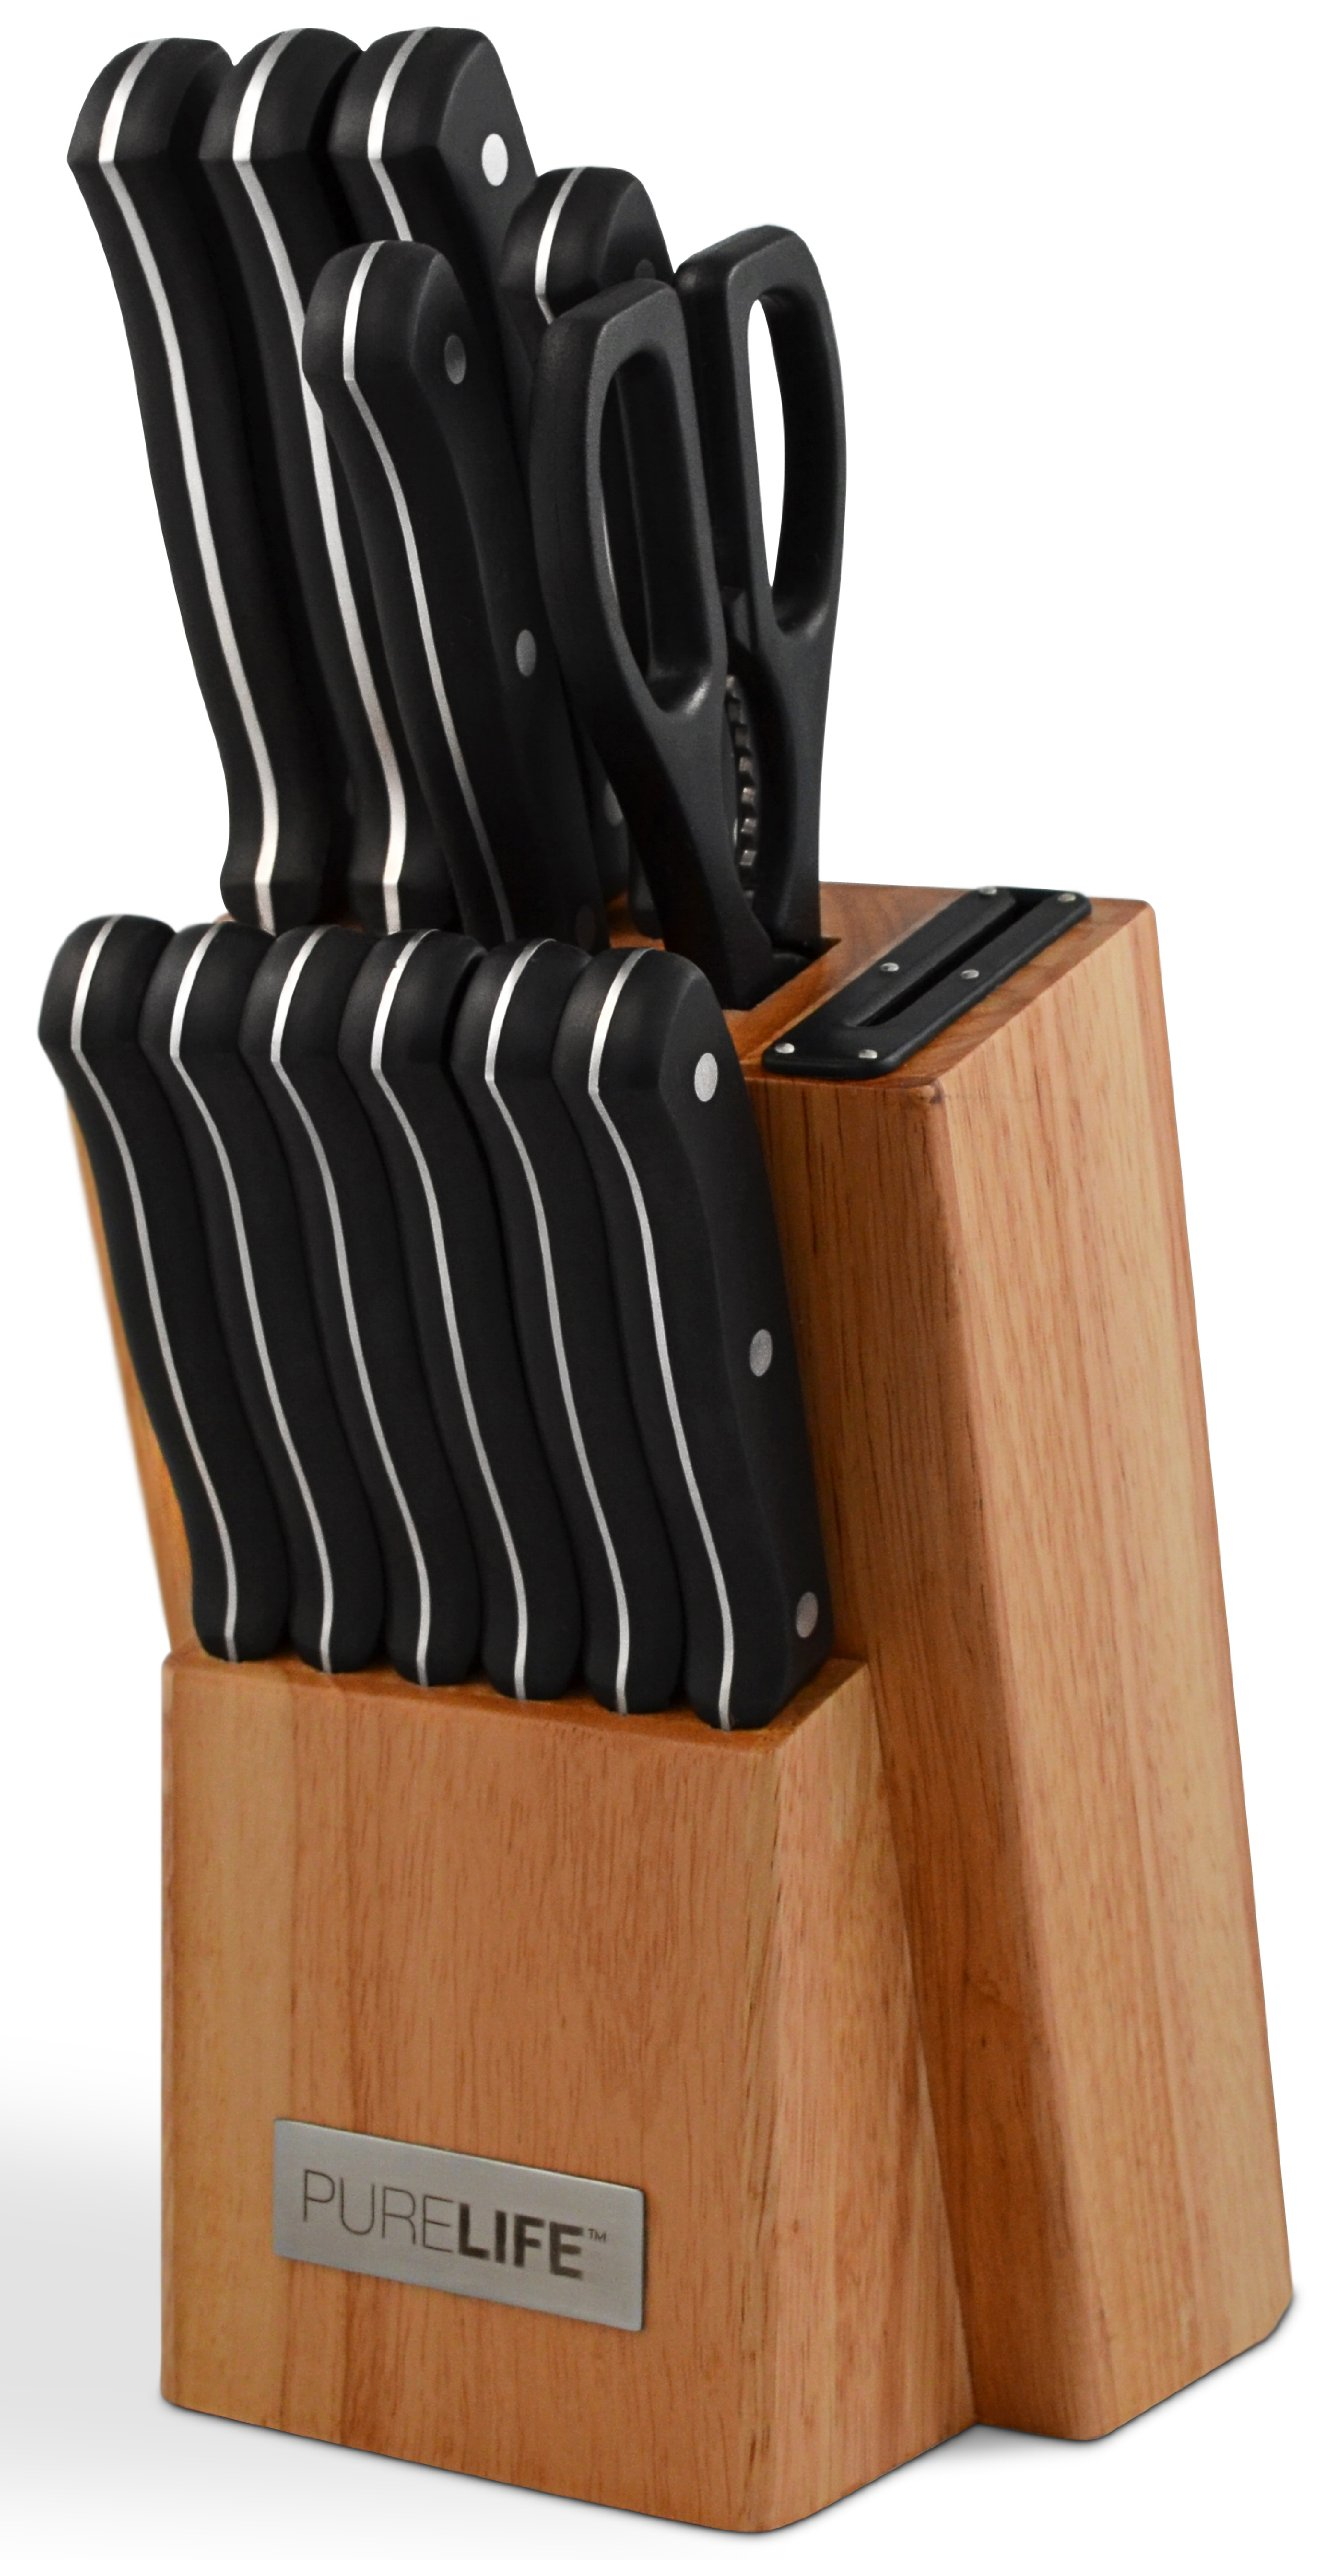 PureLife Ragalta PLKS 2000 Series 13-Piece High Carbon Stainless Steel Cutlery Set with Block and Bakelite Handles, Black